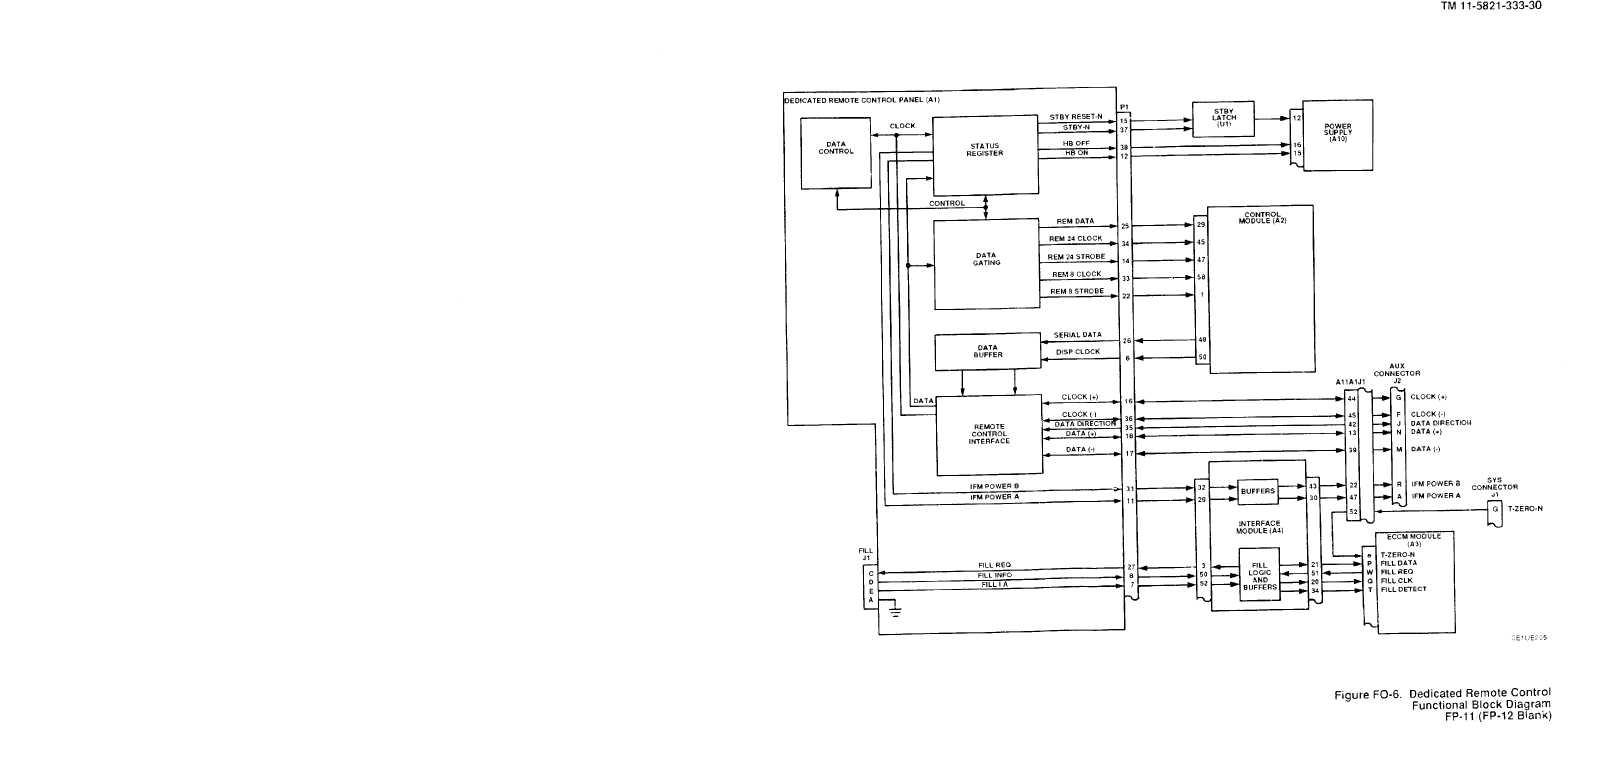 Figure Fo 6 Dedicated Remote Control Functional Block Diagram